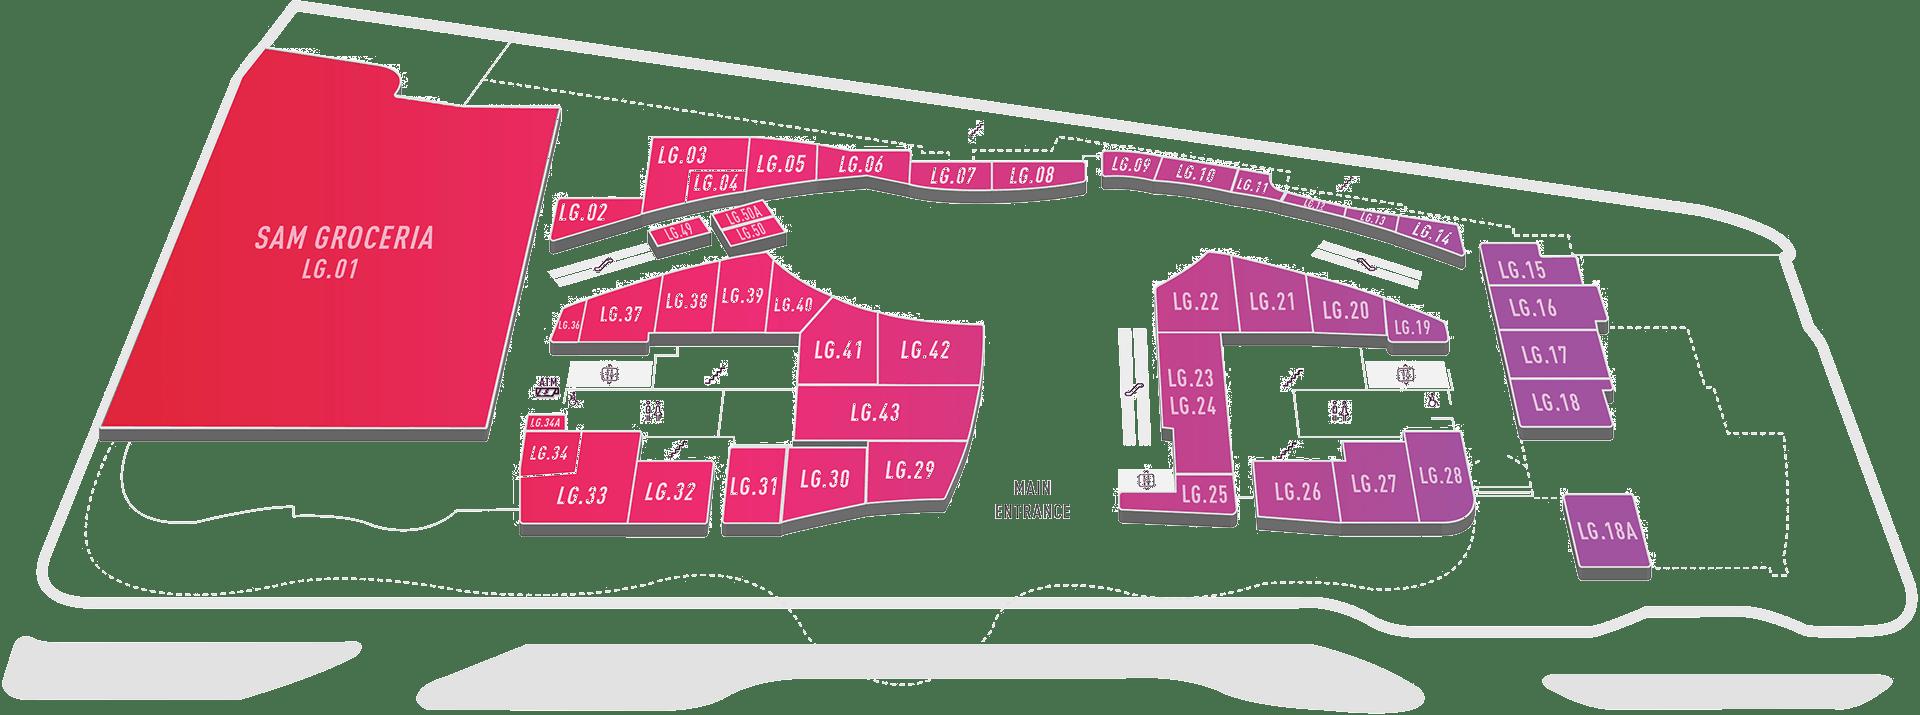 lower-ground-floor-nu-sentral